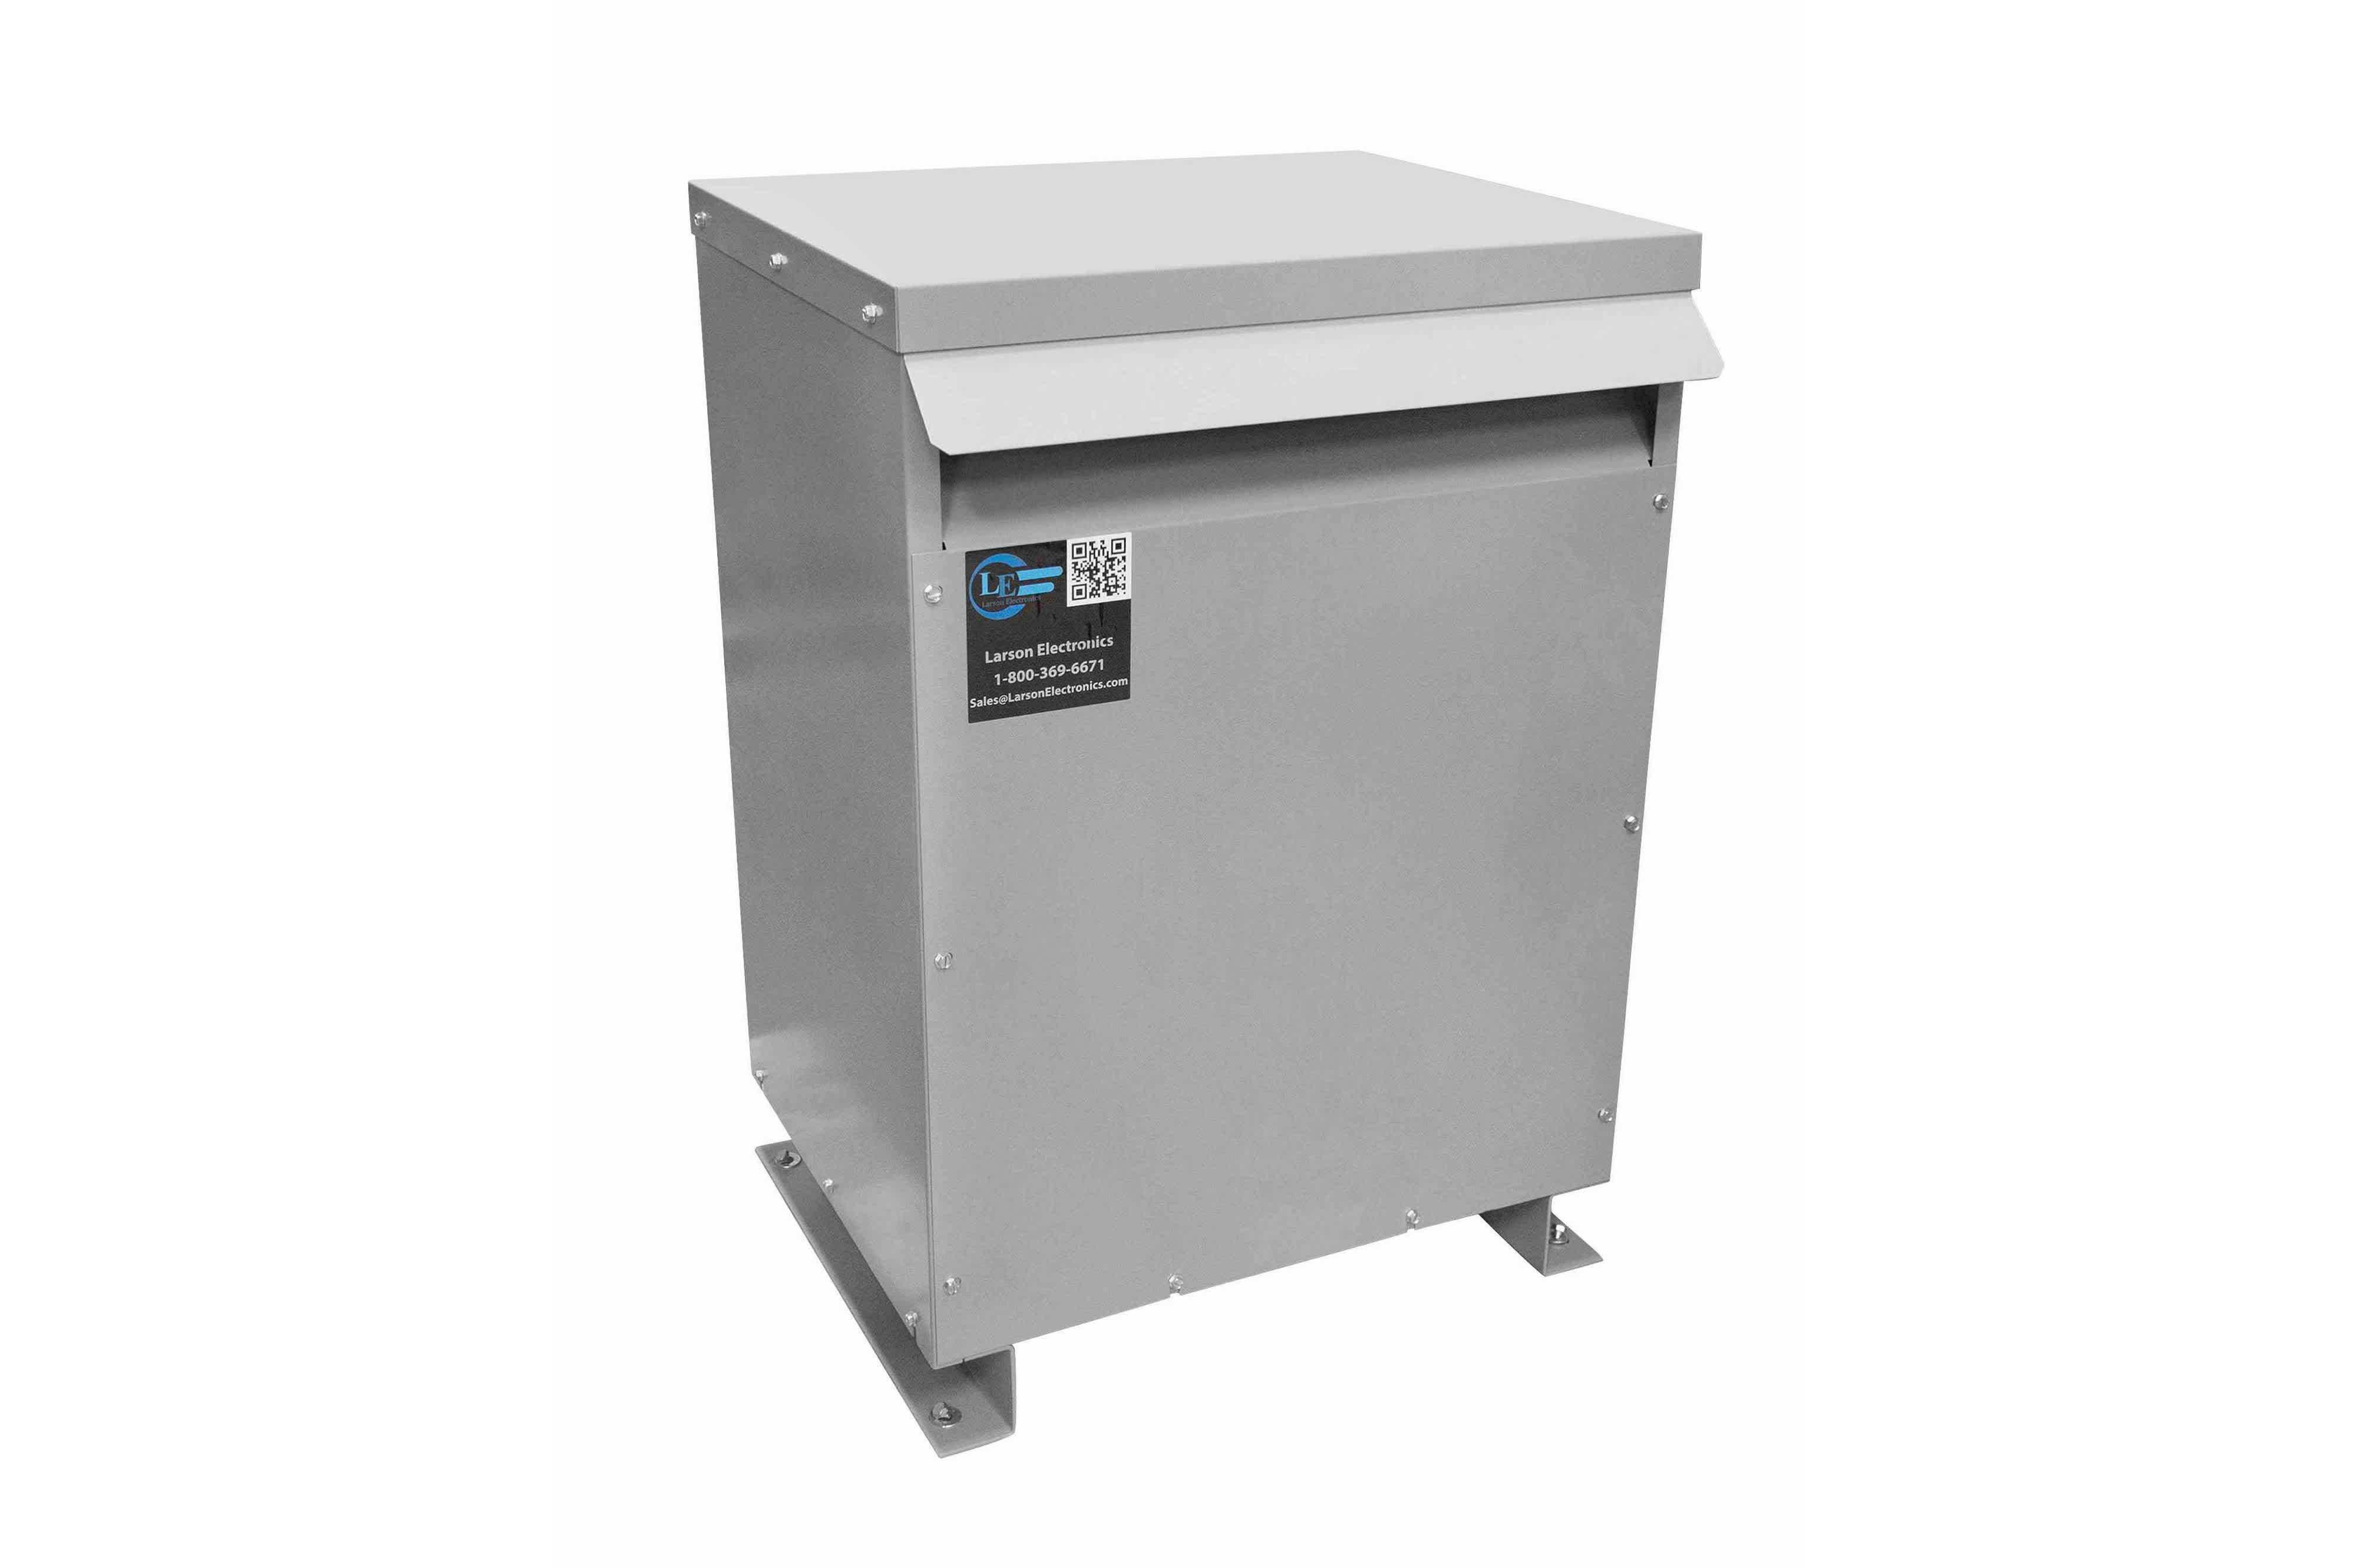 13 kVA 3PH Isolation Transformer, 240V Wye Primary, 600Y/347 Wye-N Secondary, N3R, Ventilated, 60 Hz